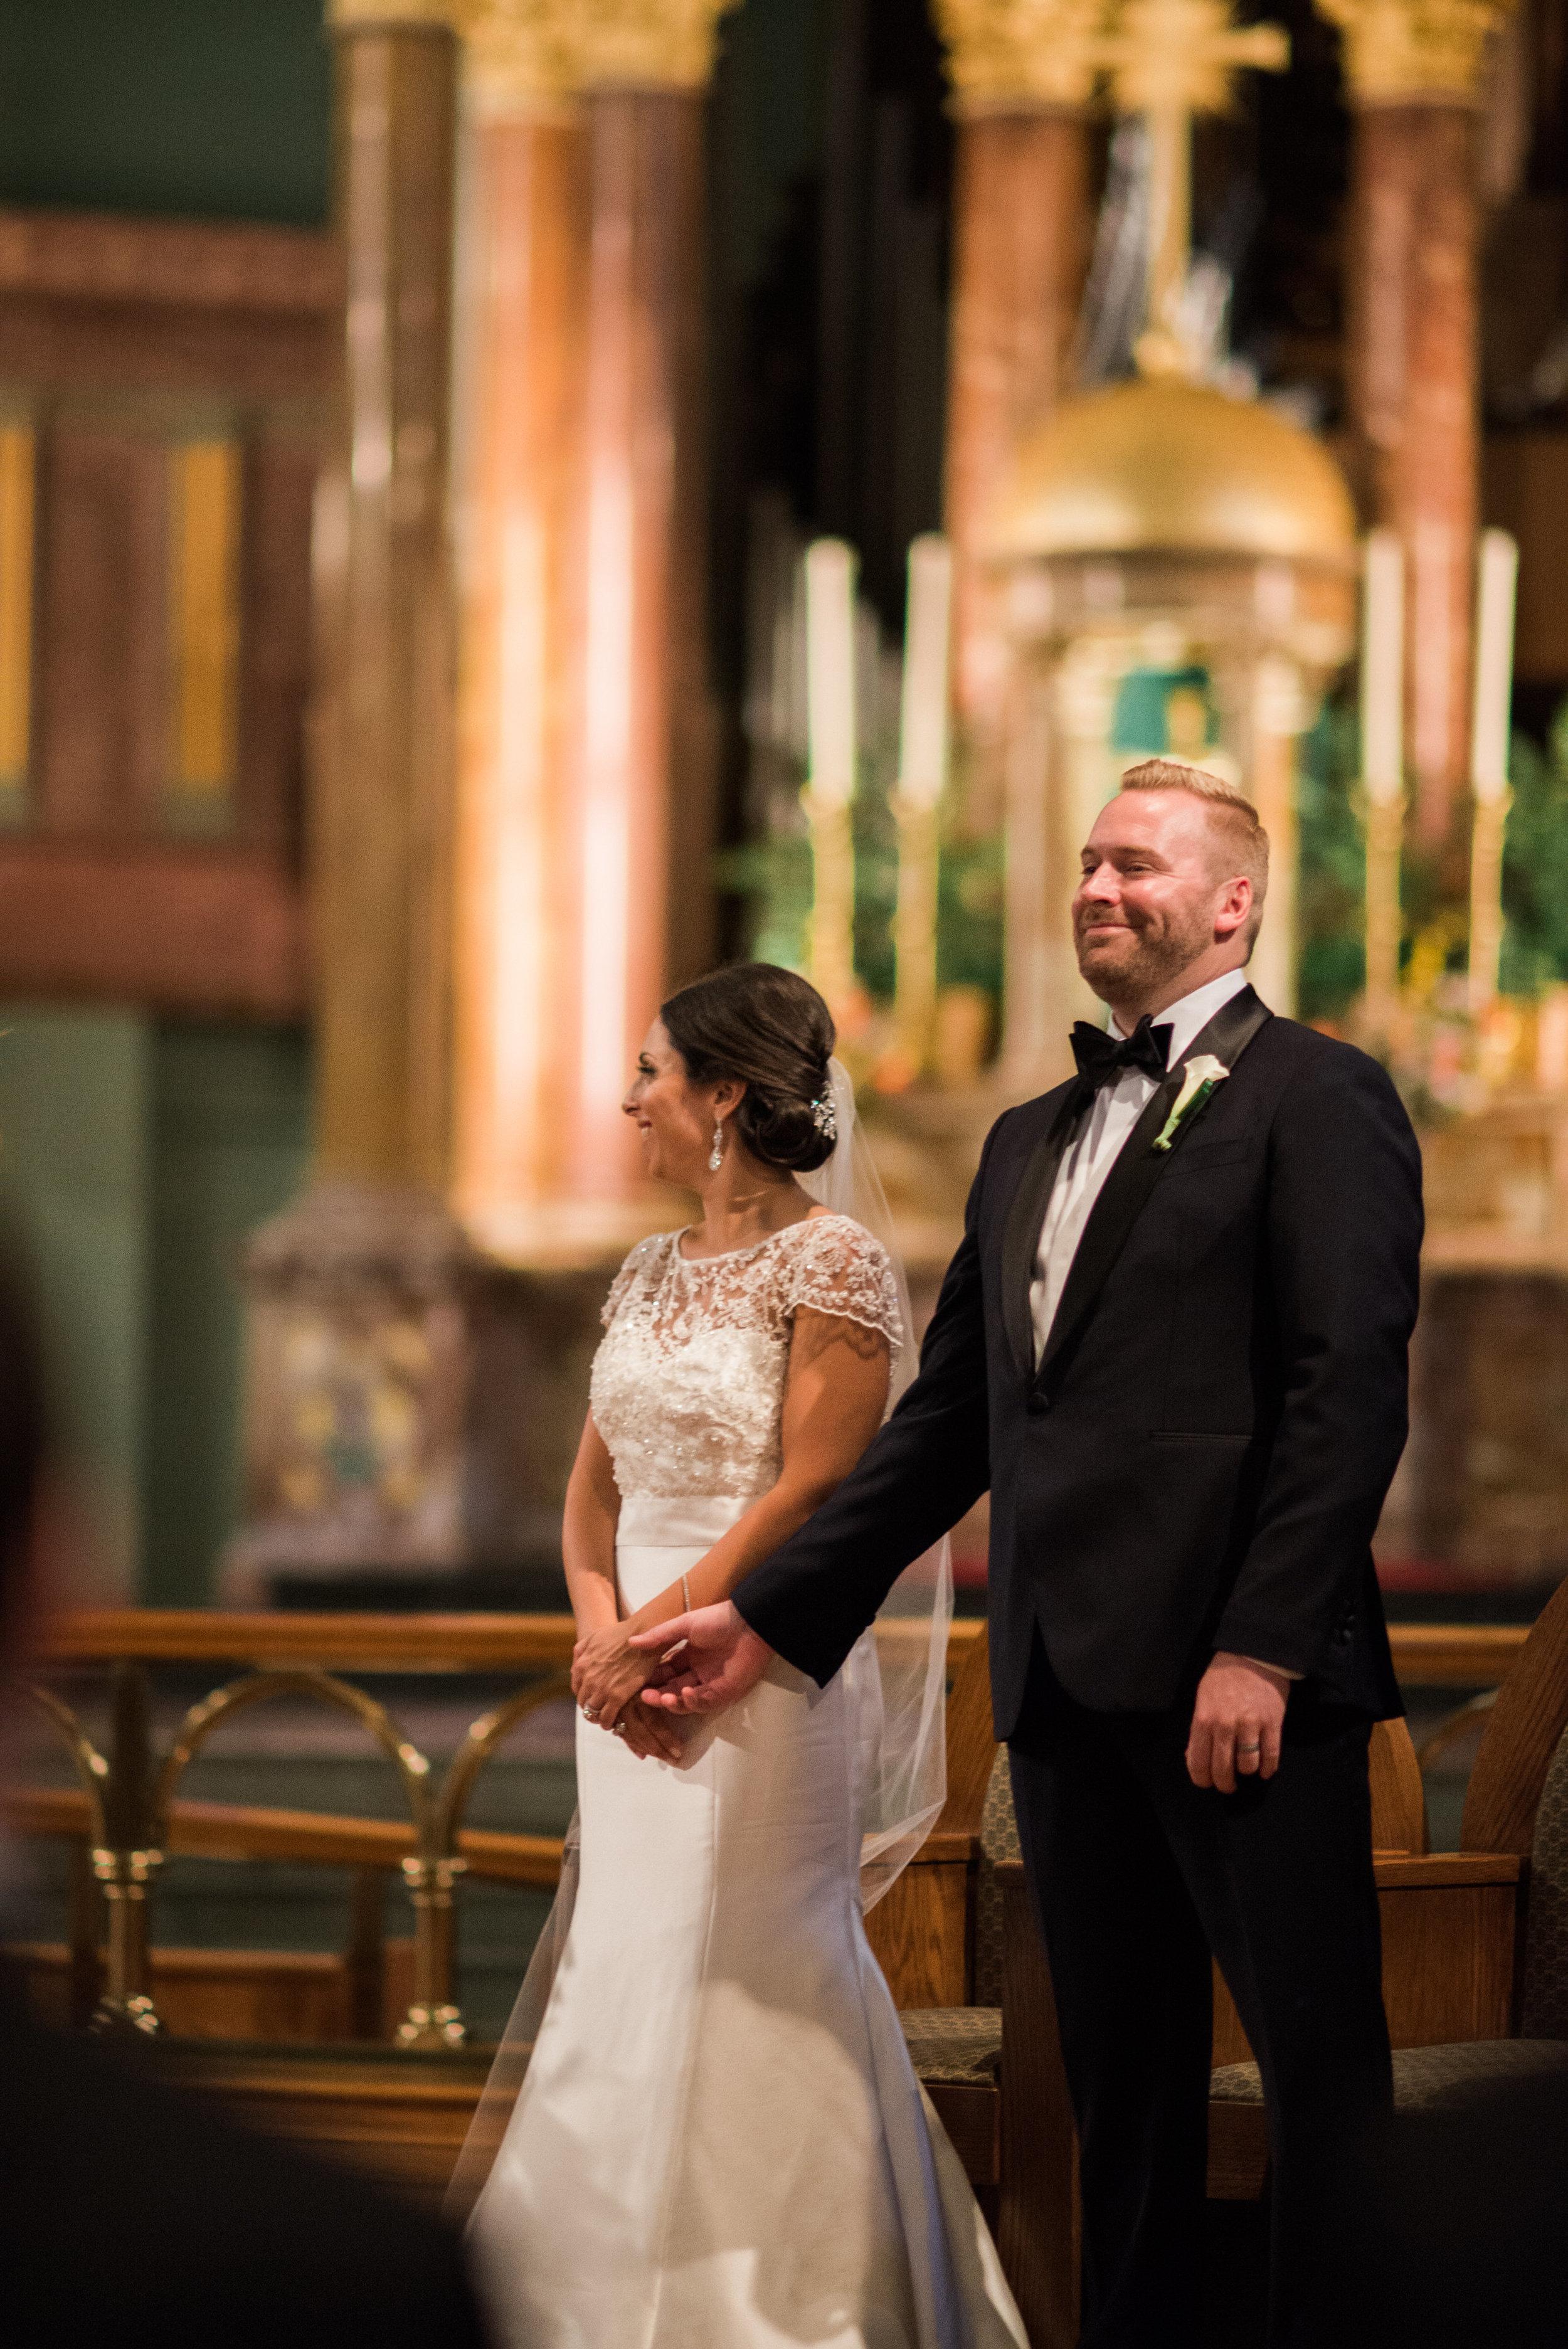 08 08 2015 John and Kristen Leone-05 Church Ceremony-0128.jpg